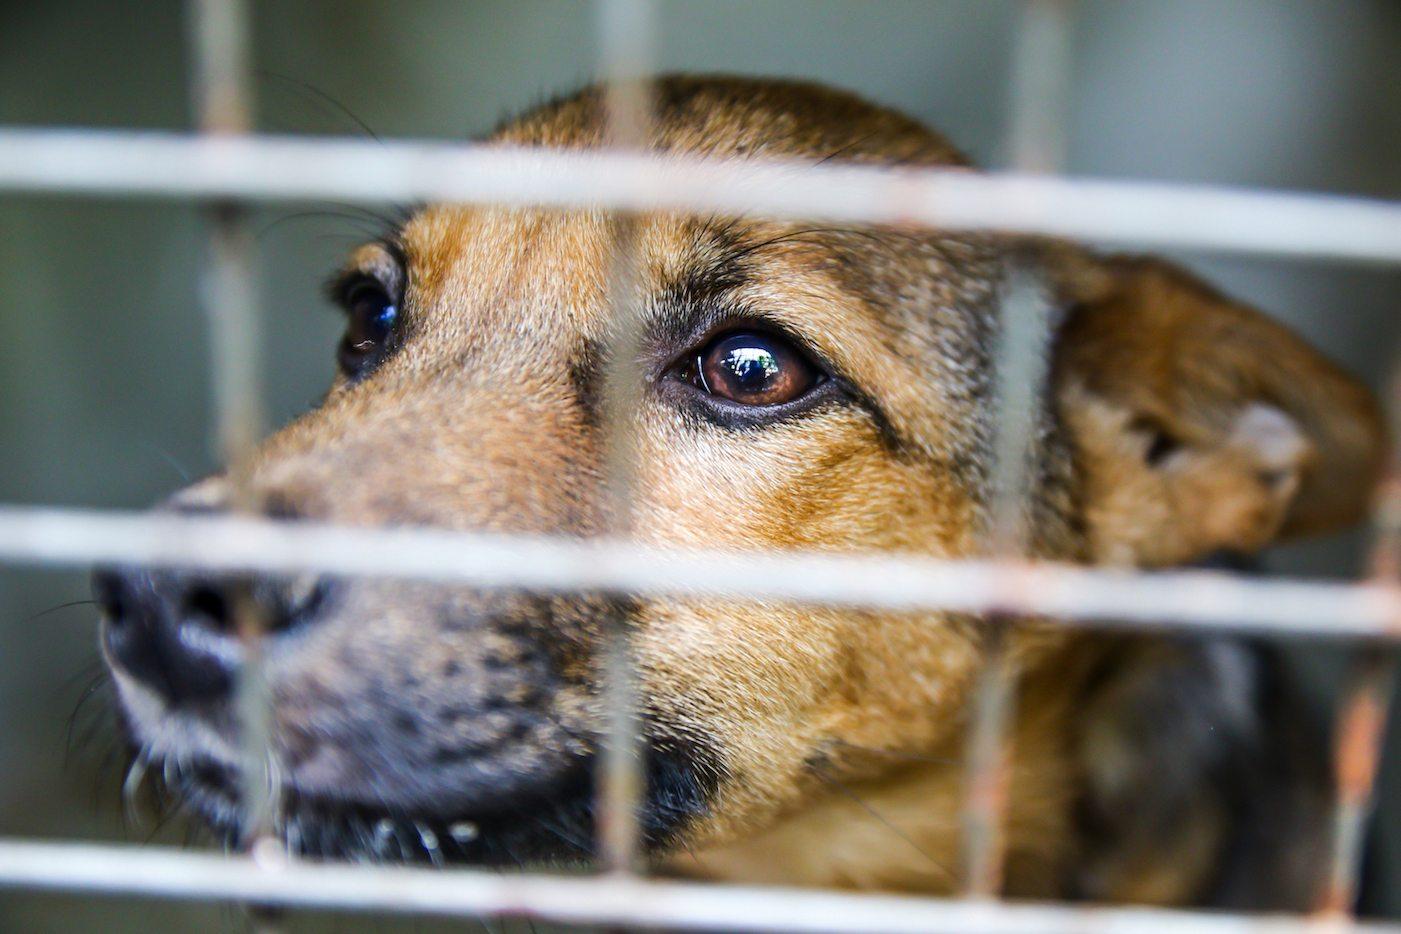 Animal Carers suffer Compassion Fatigue